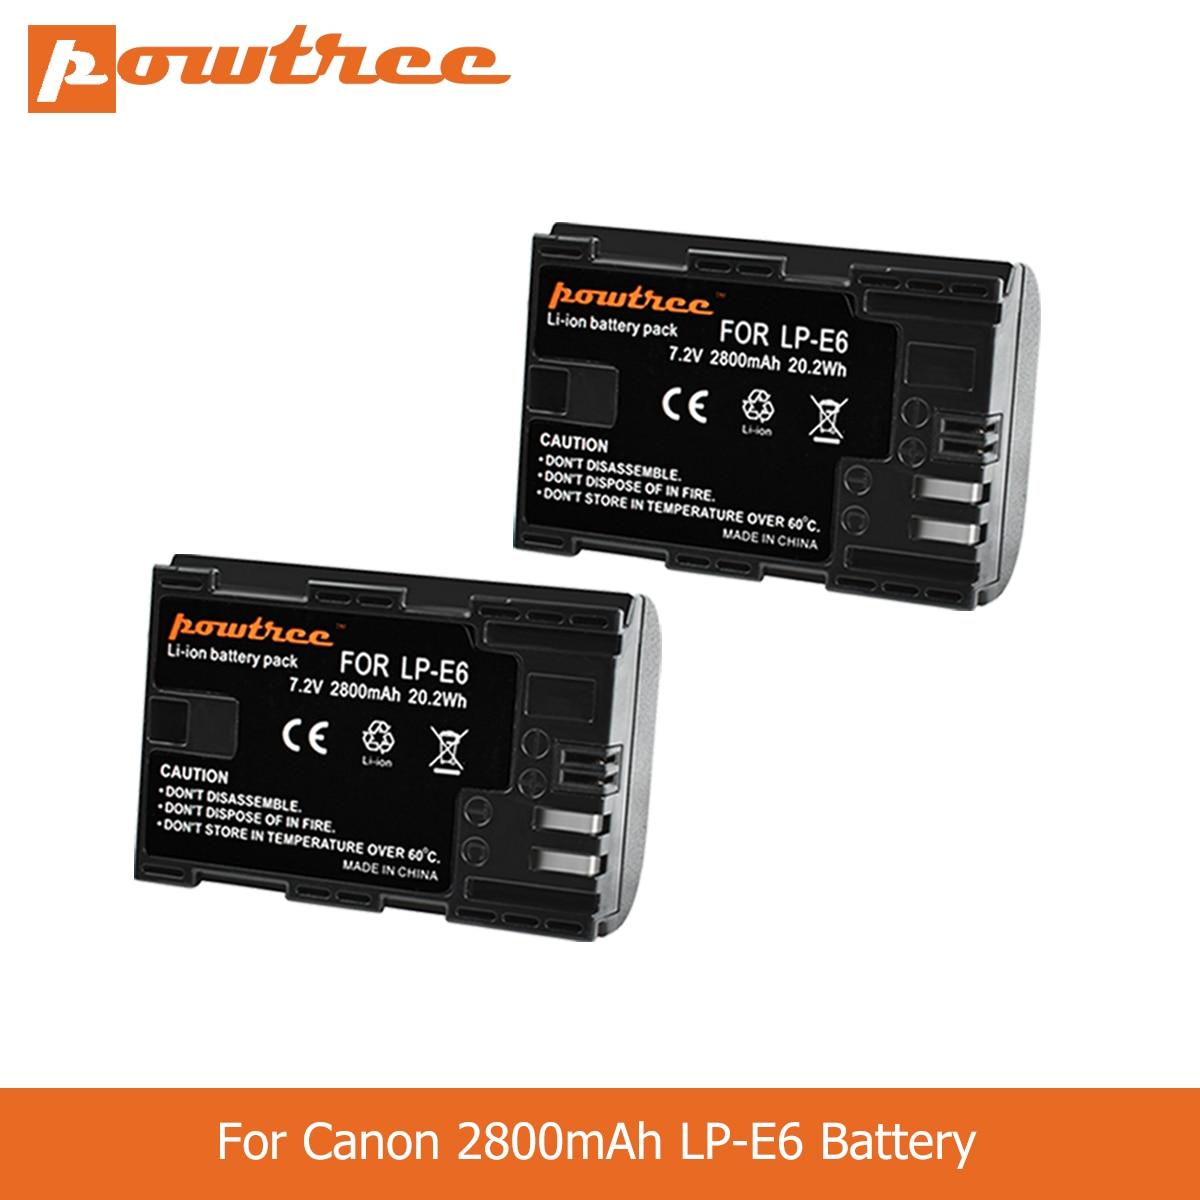 POWTREE 2800mAh LP-E6 LP E6 LPE6 Camera Battery For Canon 5D Mark II III 7D 60D EOS 6D 70D 80D For Canon Accessories L50